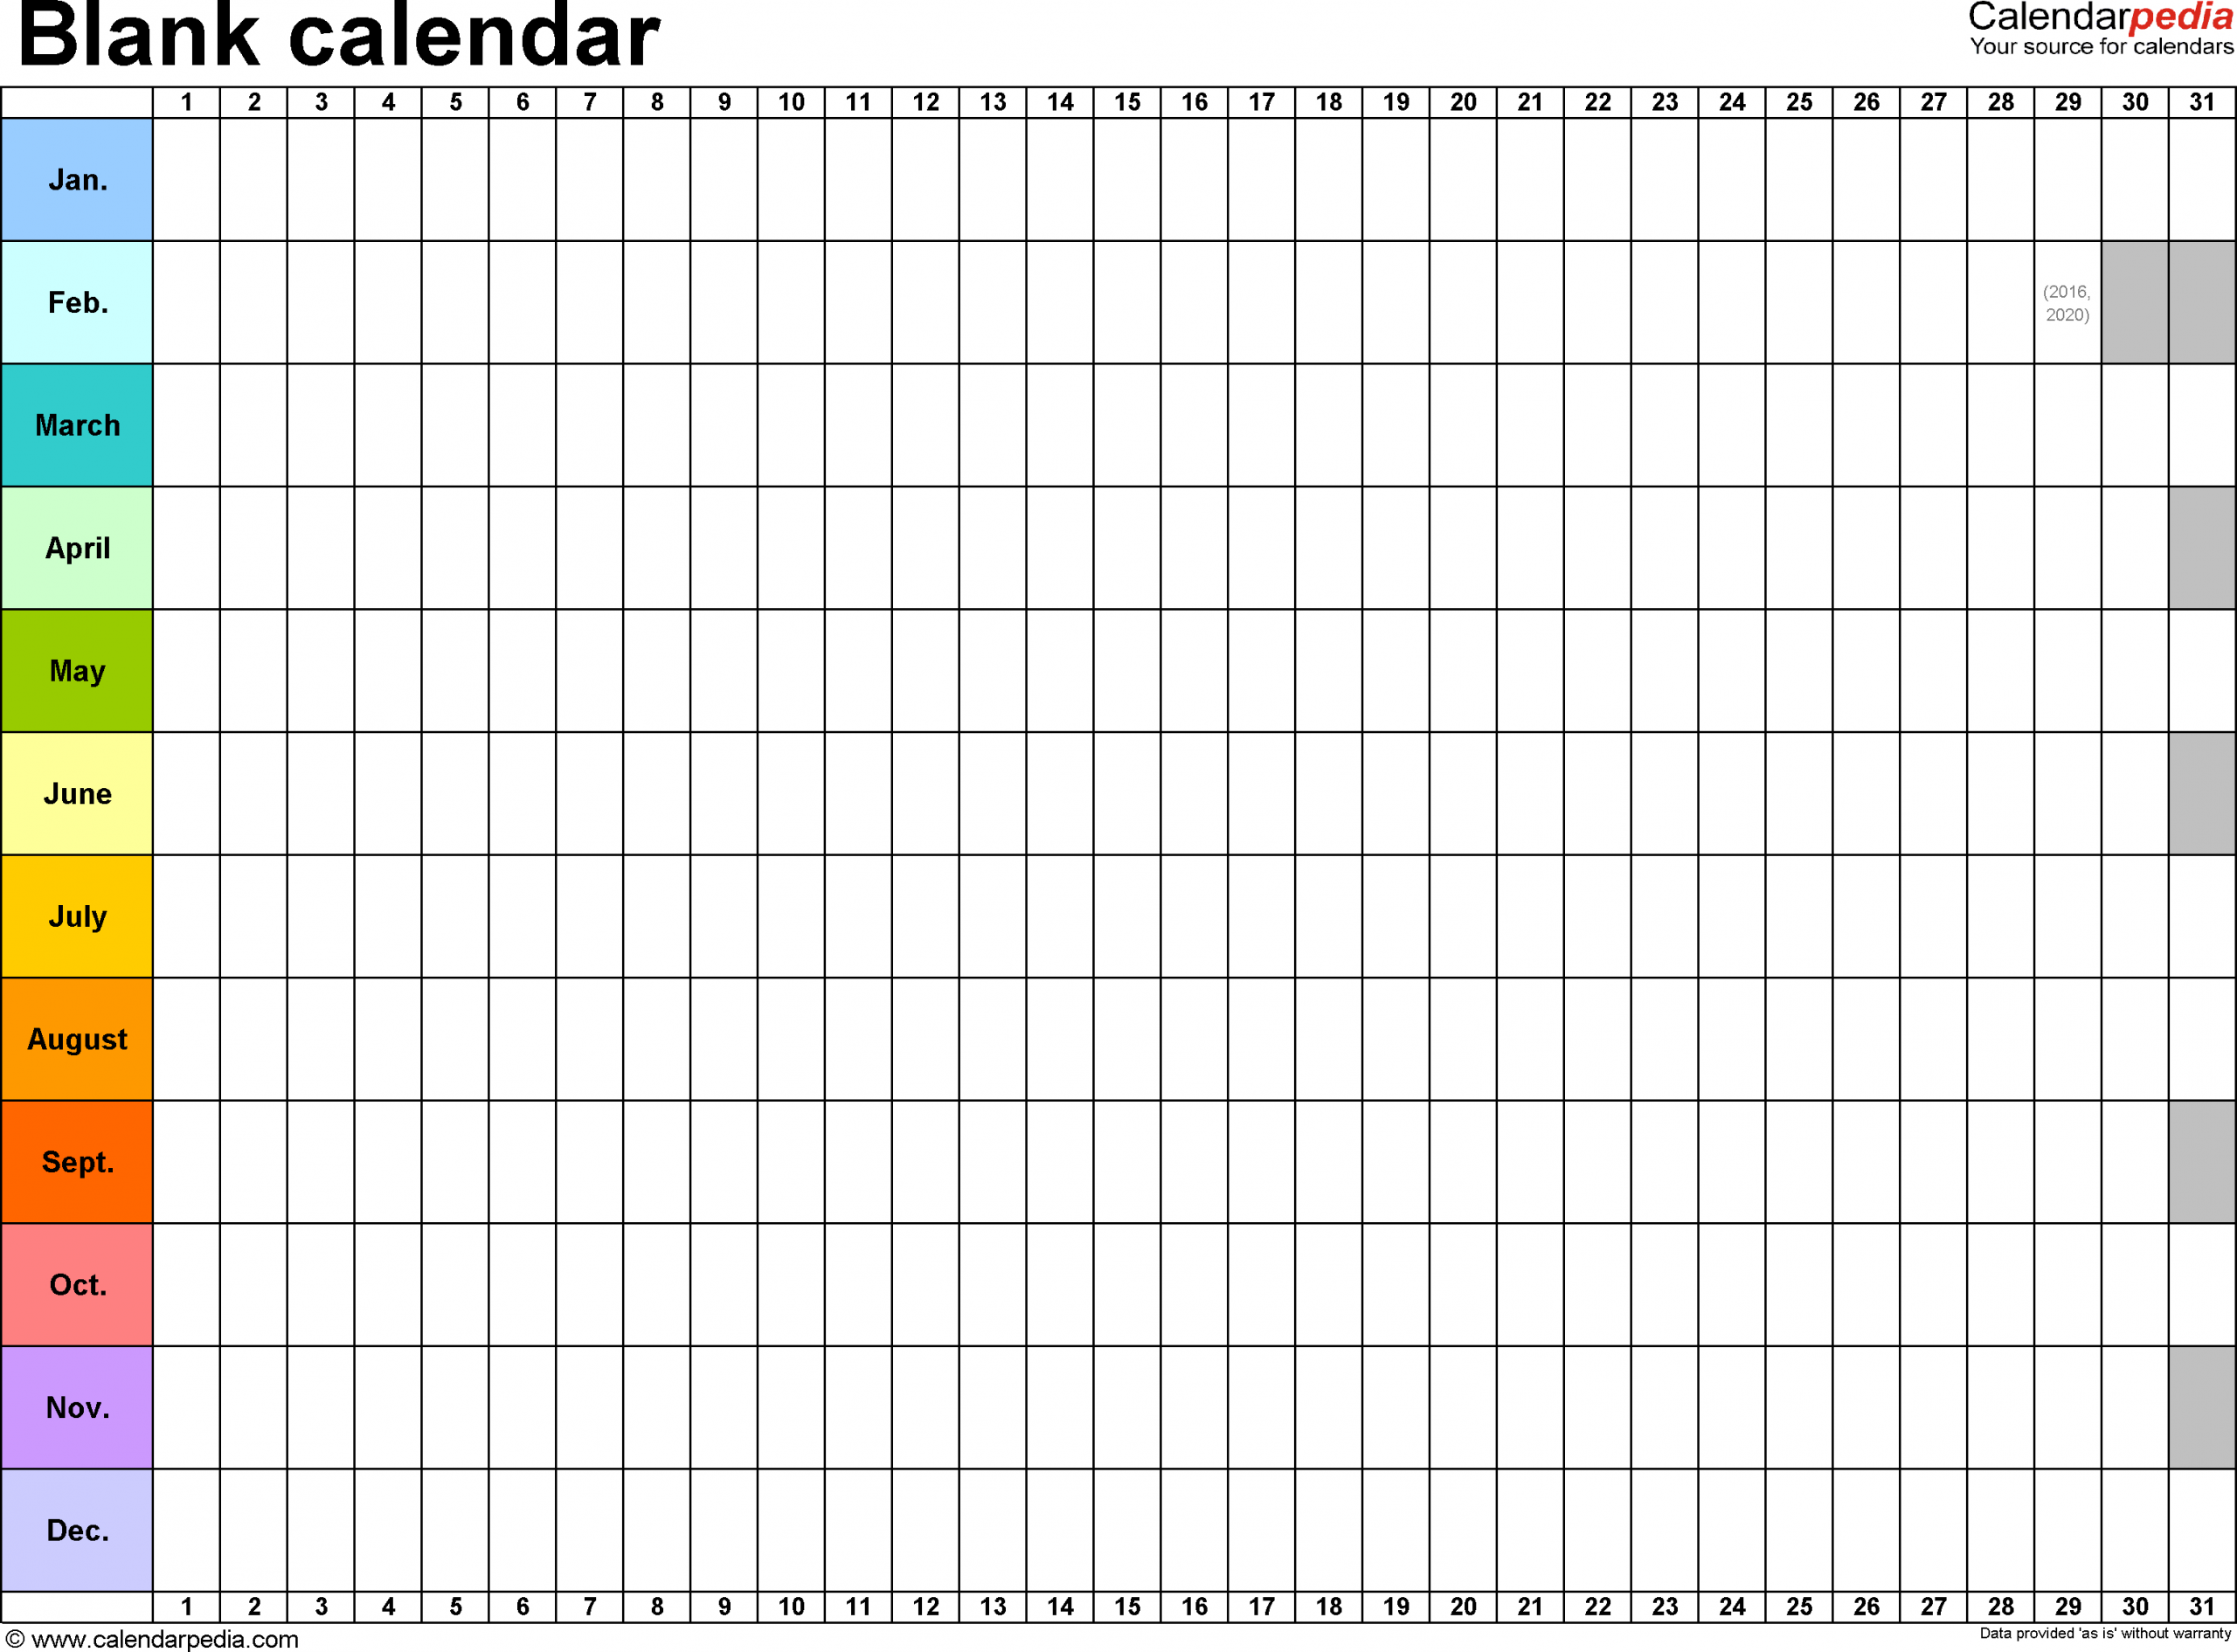 365 Day Countdown Calendar | Calendar For Planning 365 Day Electronic Countdown Calendar